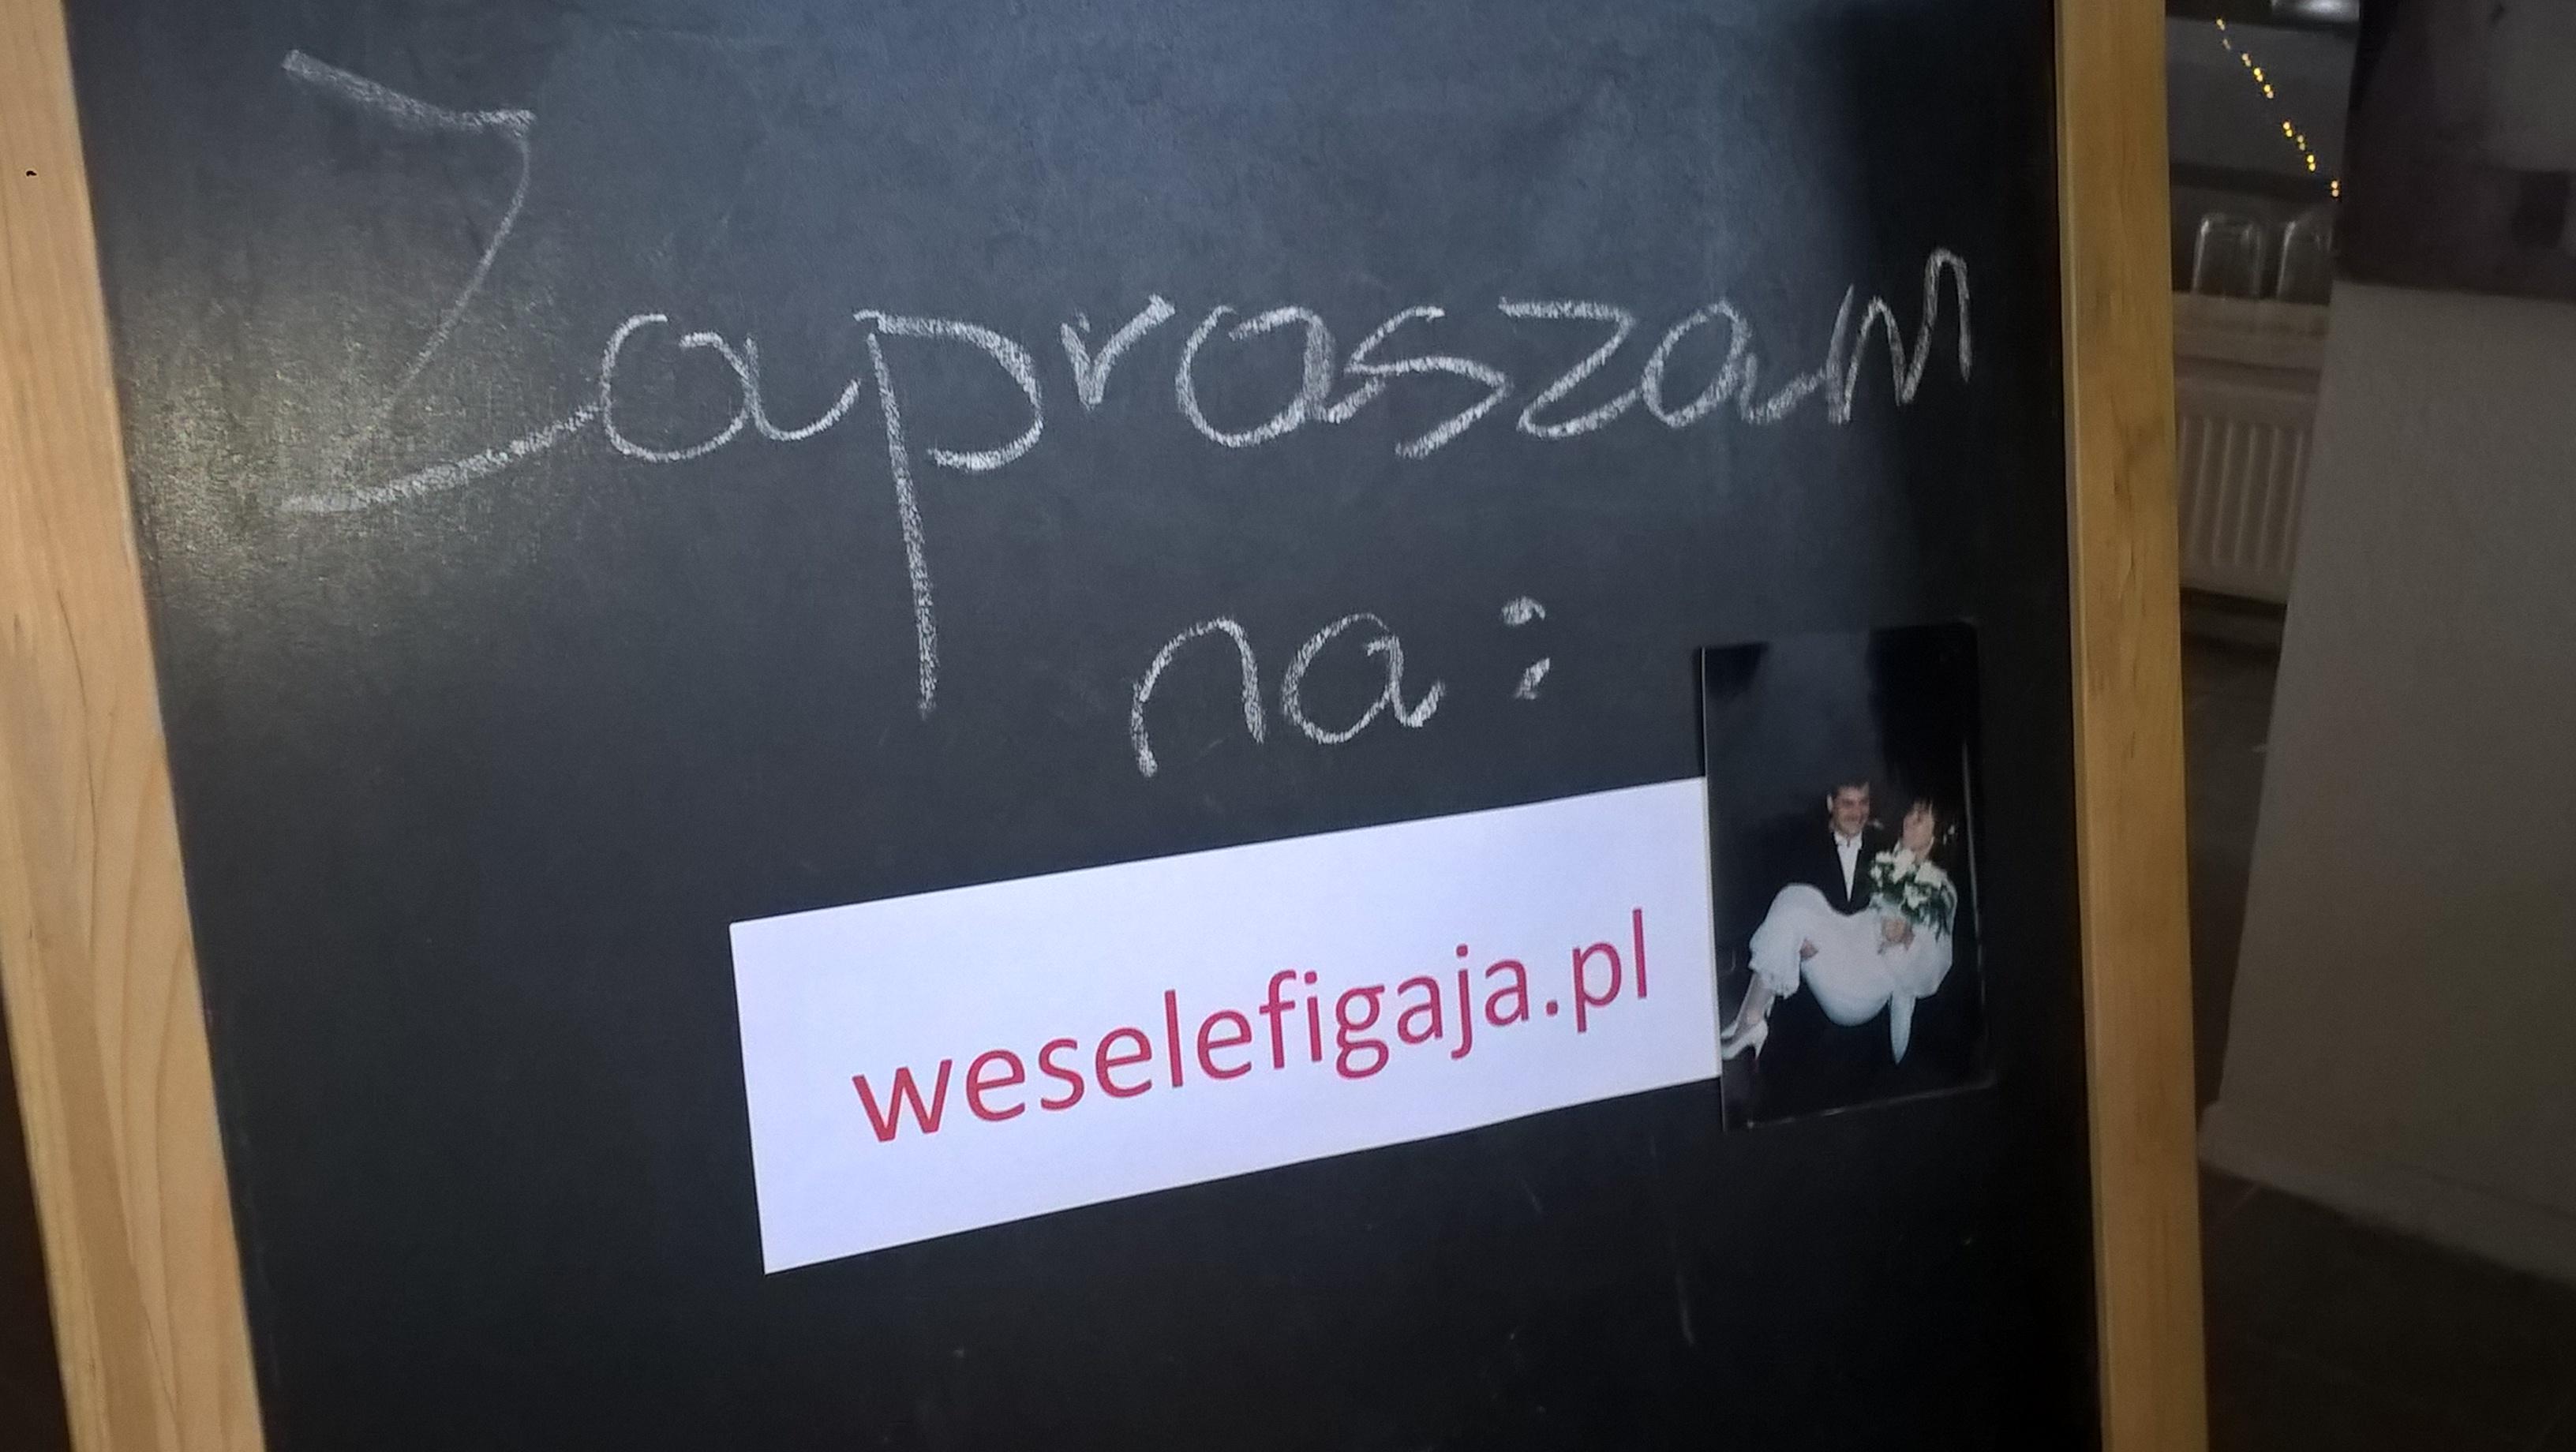 WP_20181226_10_08_02_Projpg